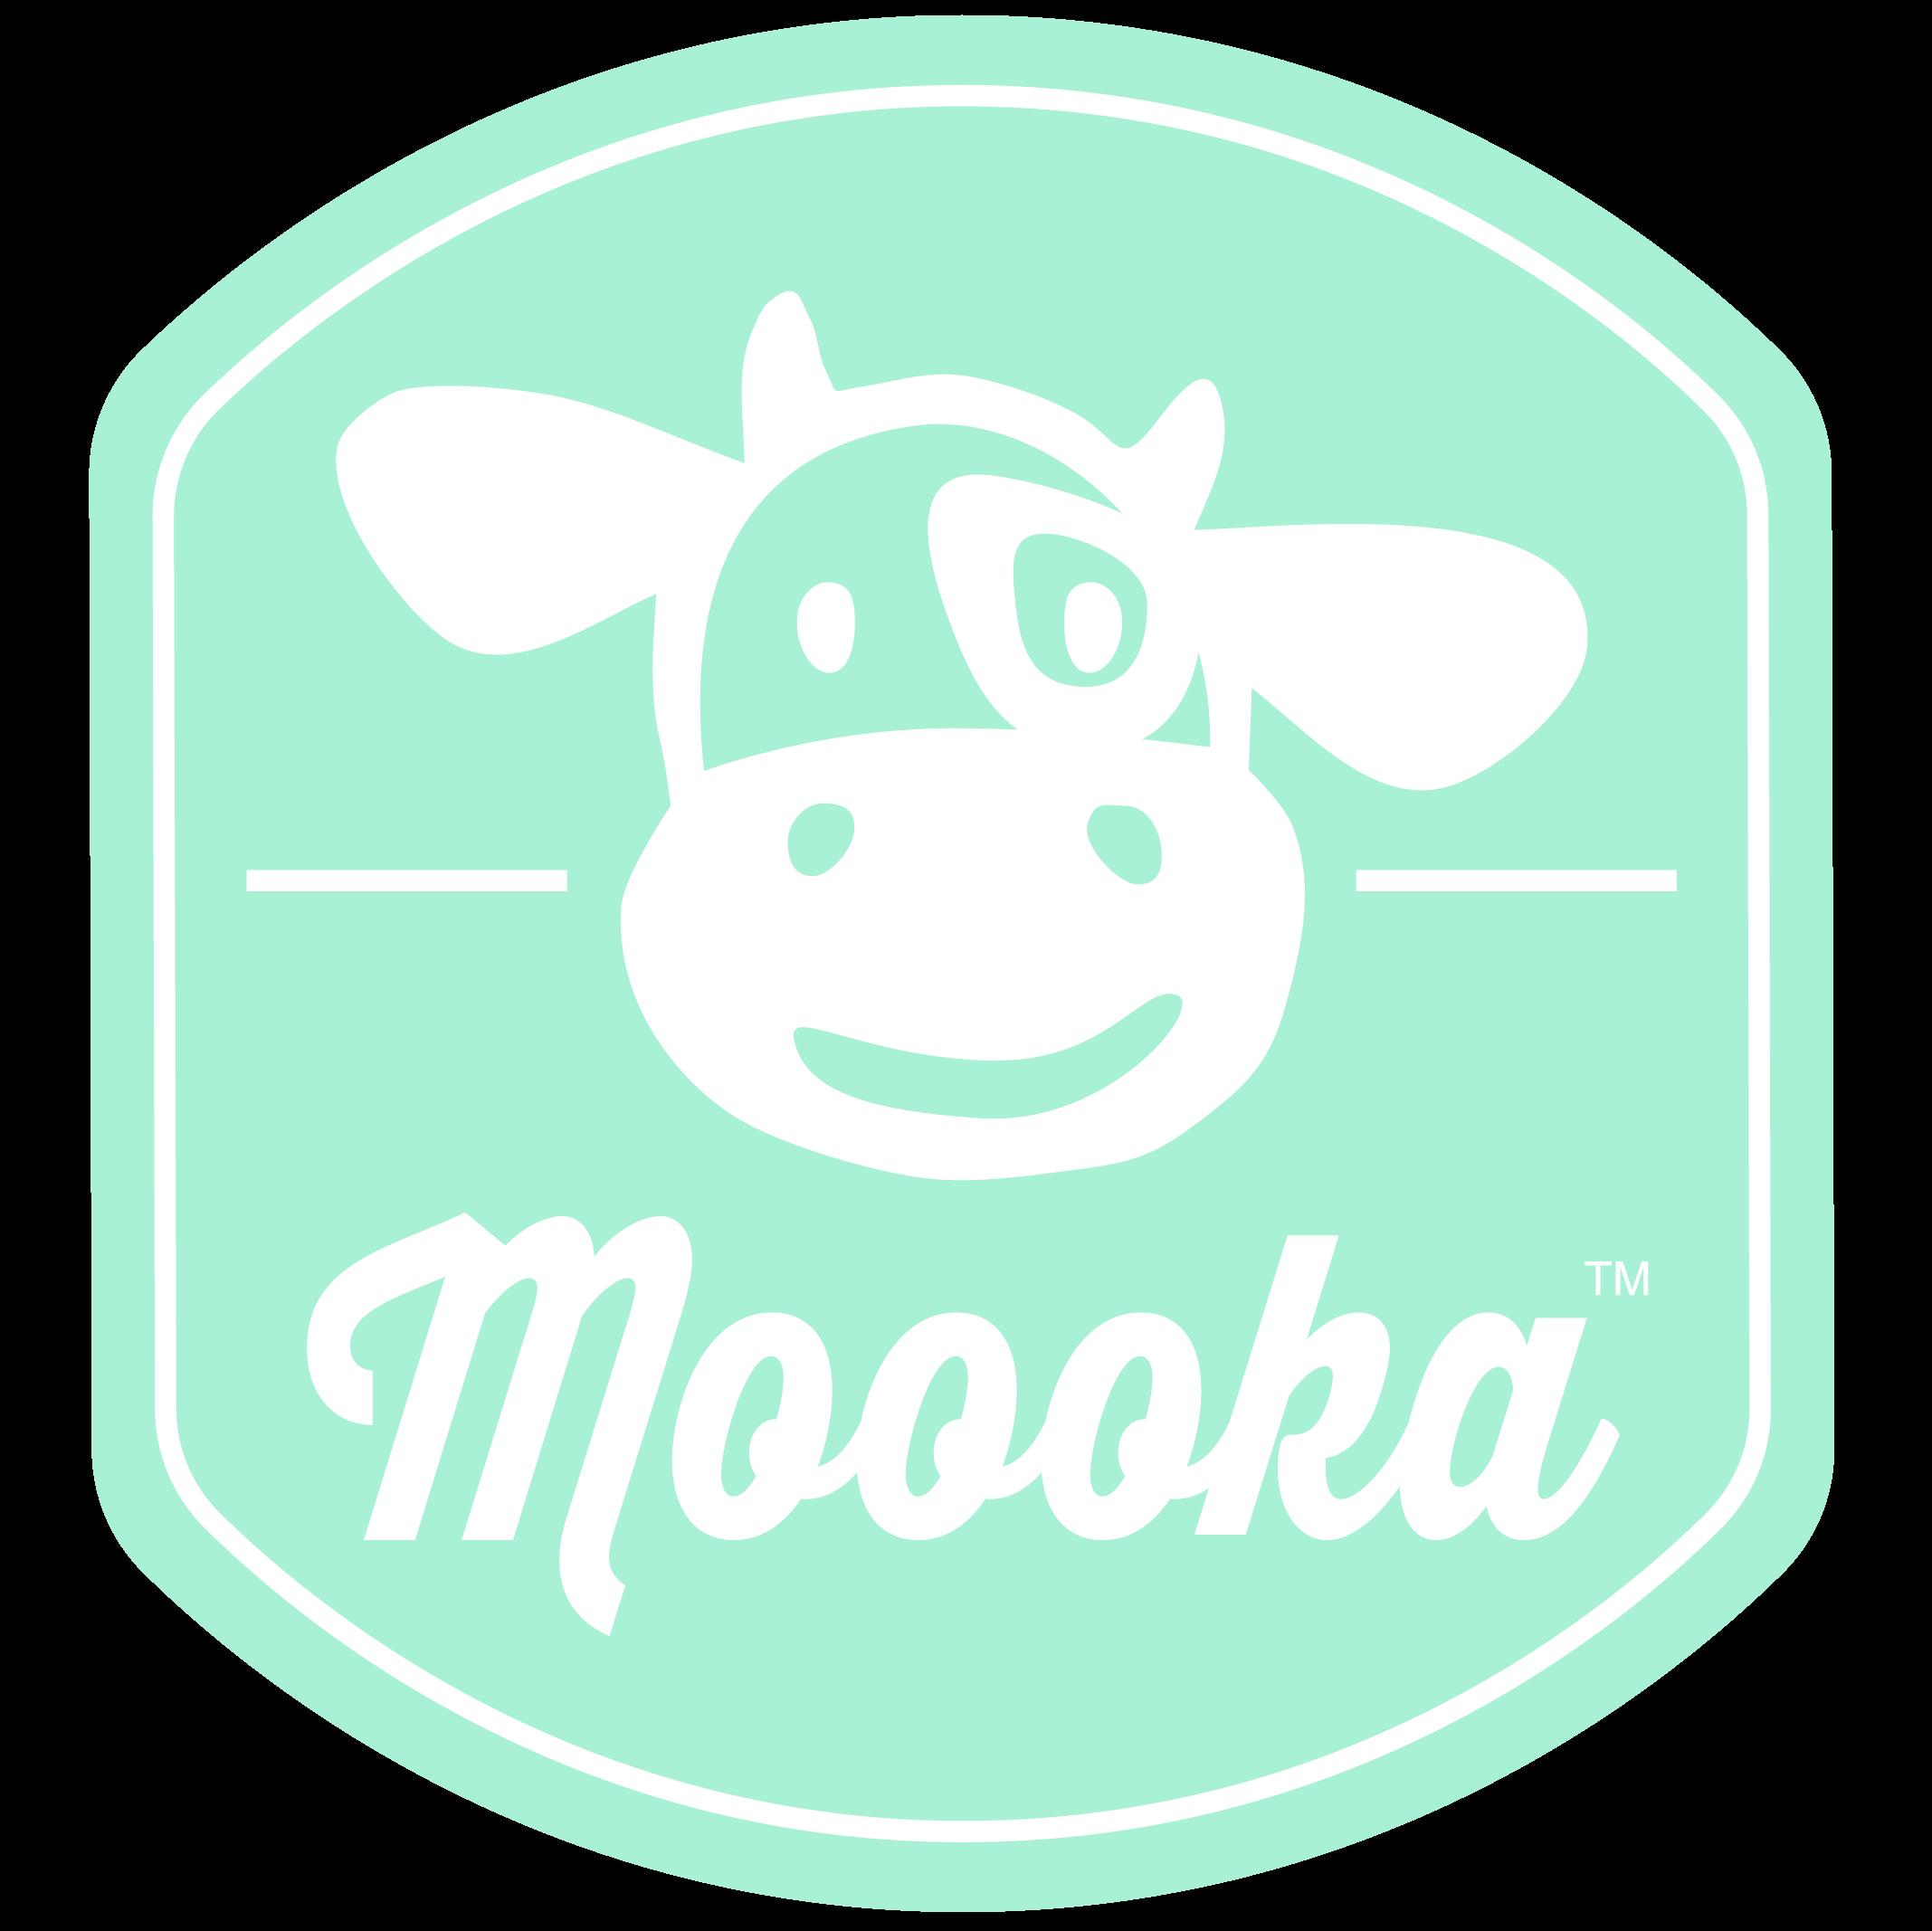 Moooka (Pty) Ltd